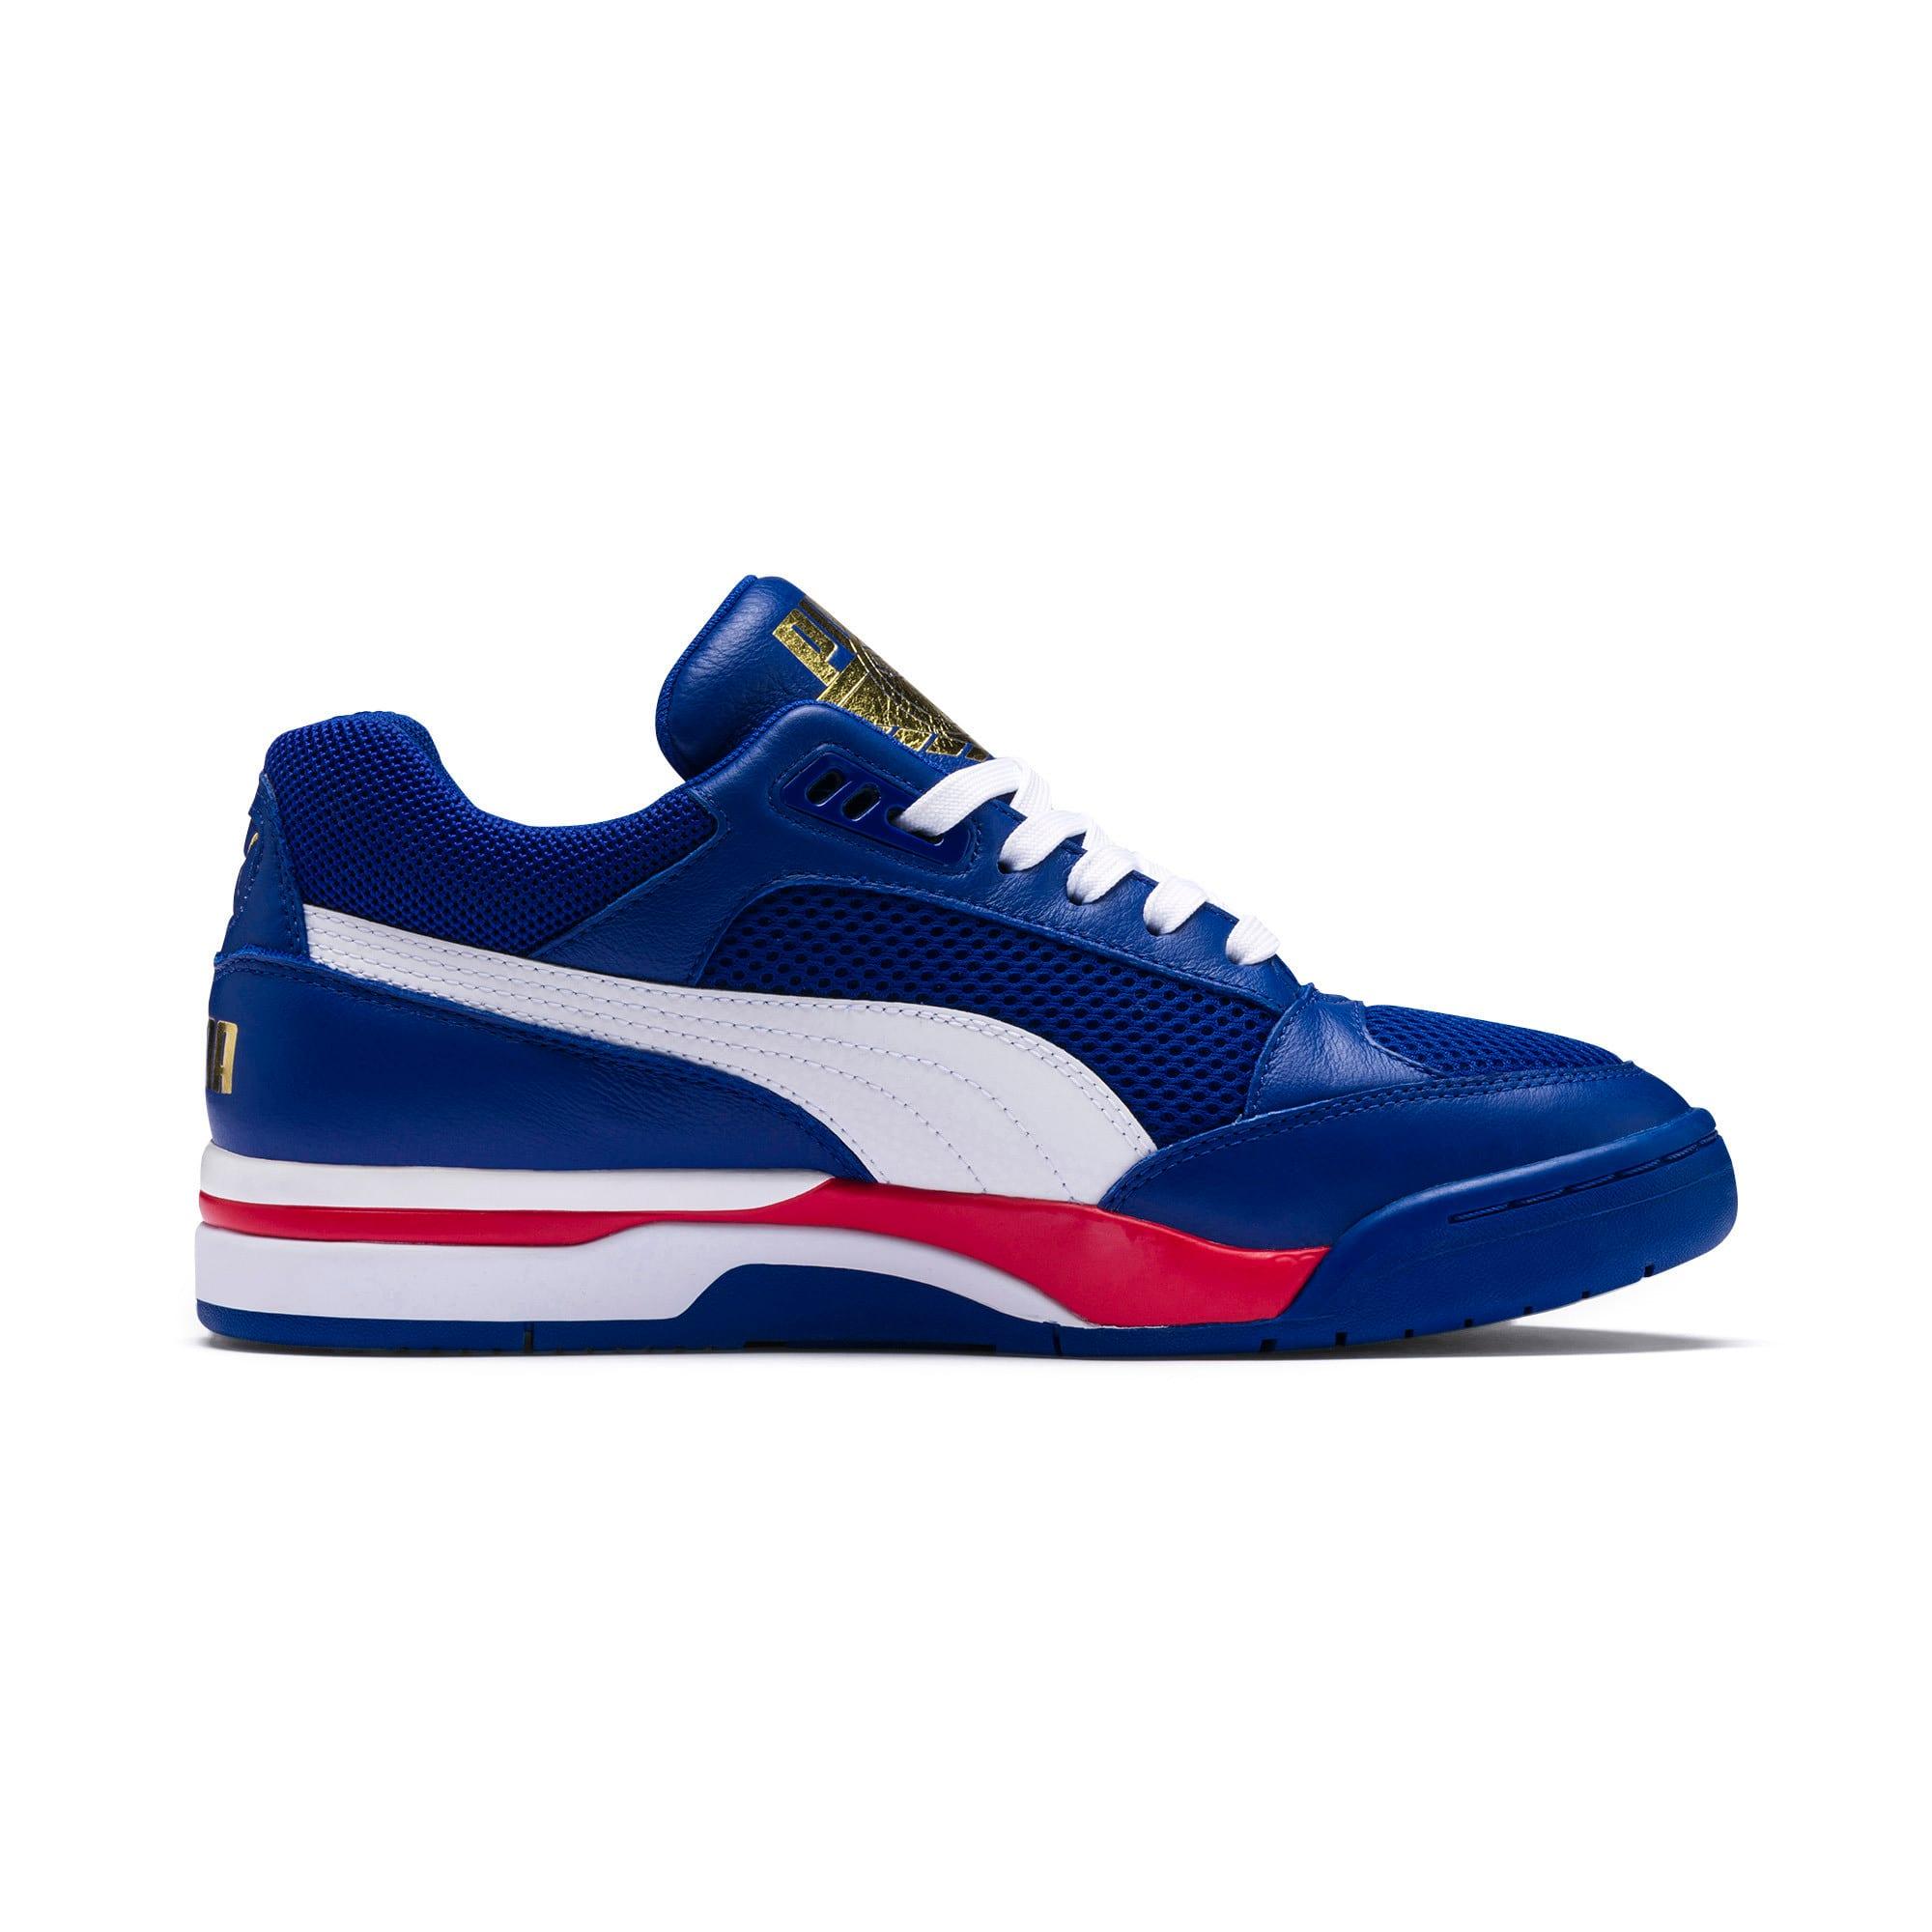 Thumbnail 5 of Palace Guard Finals Sneakers, Surf The Web-Puma White-, medium